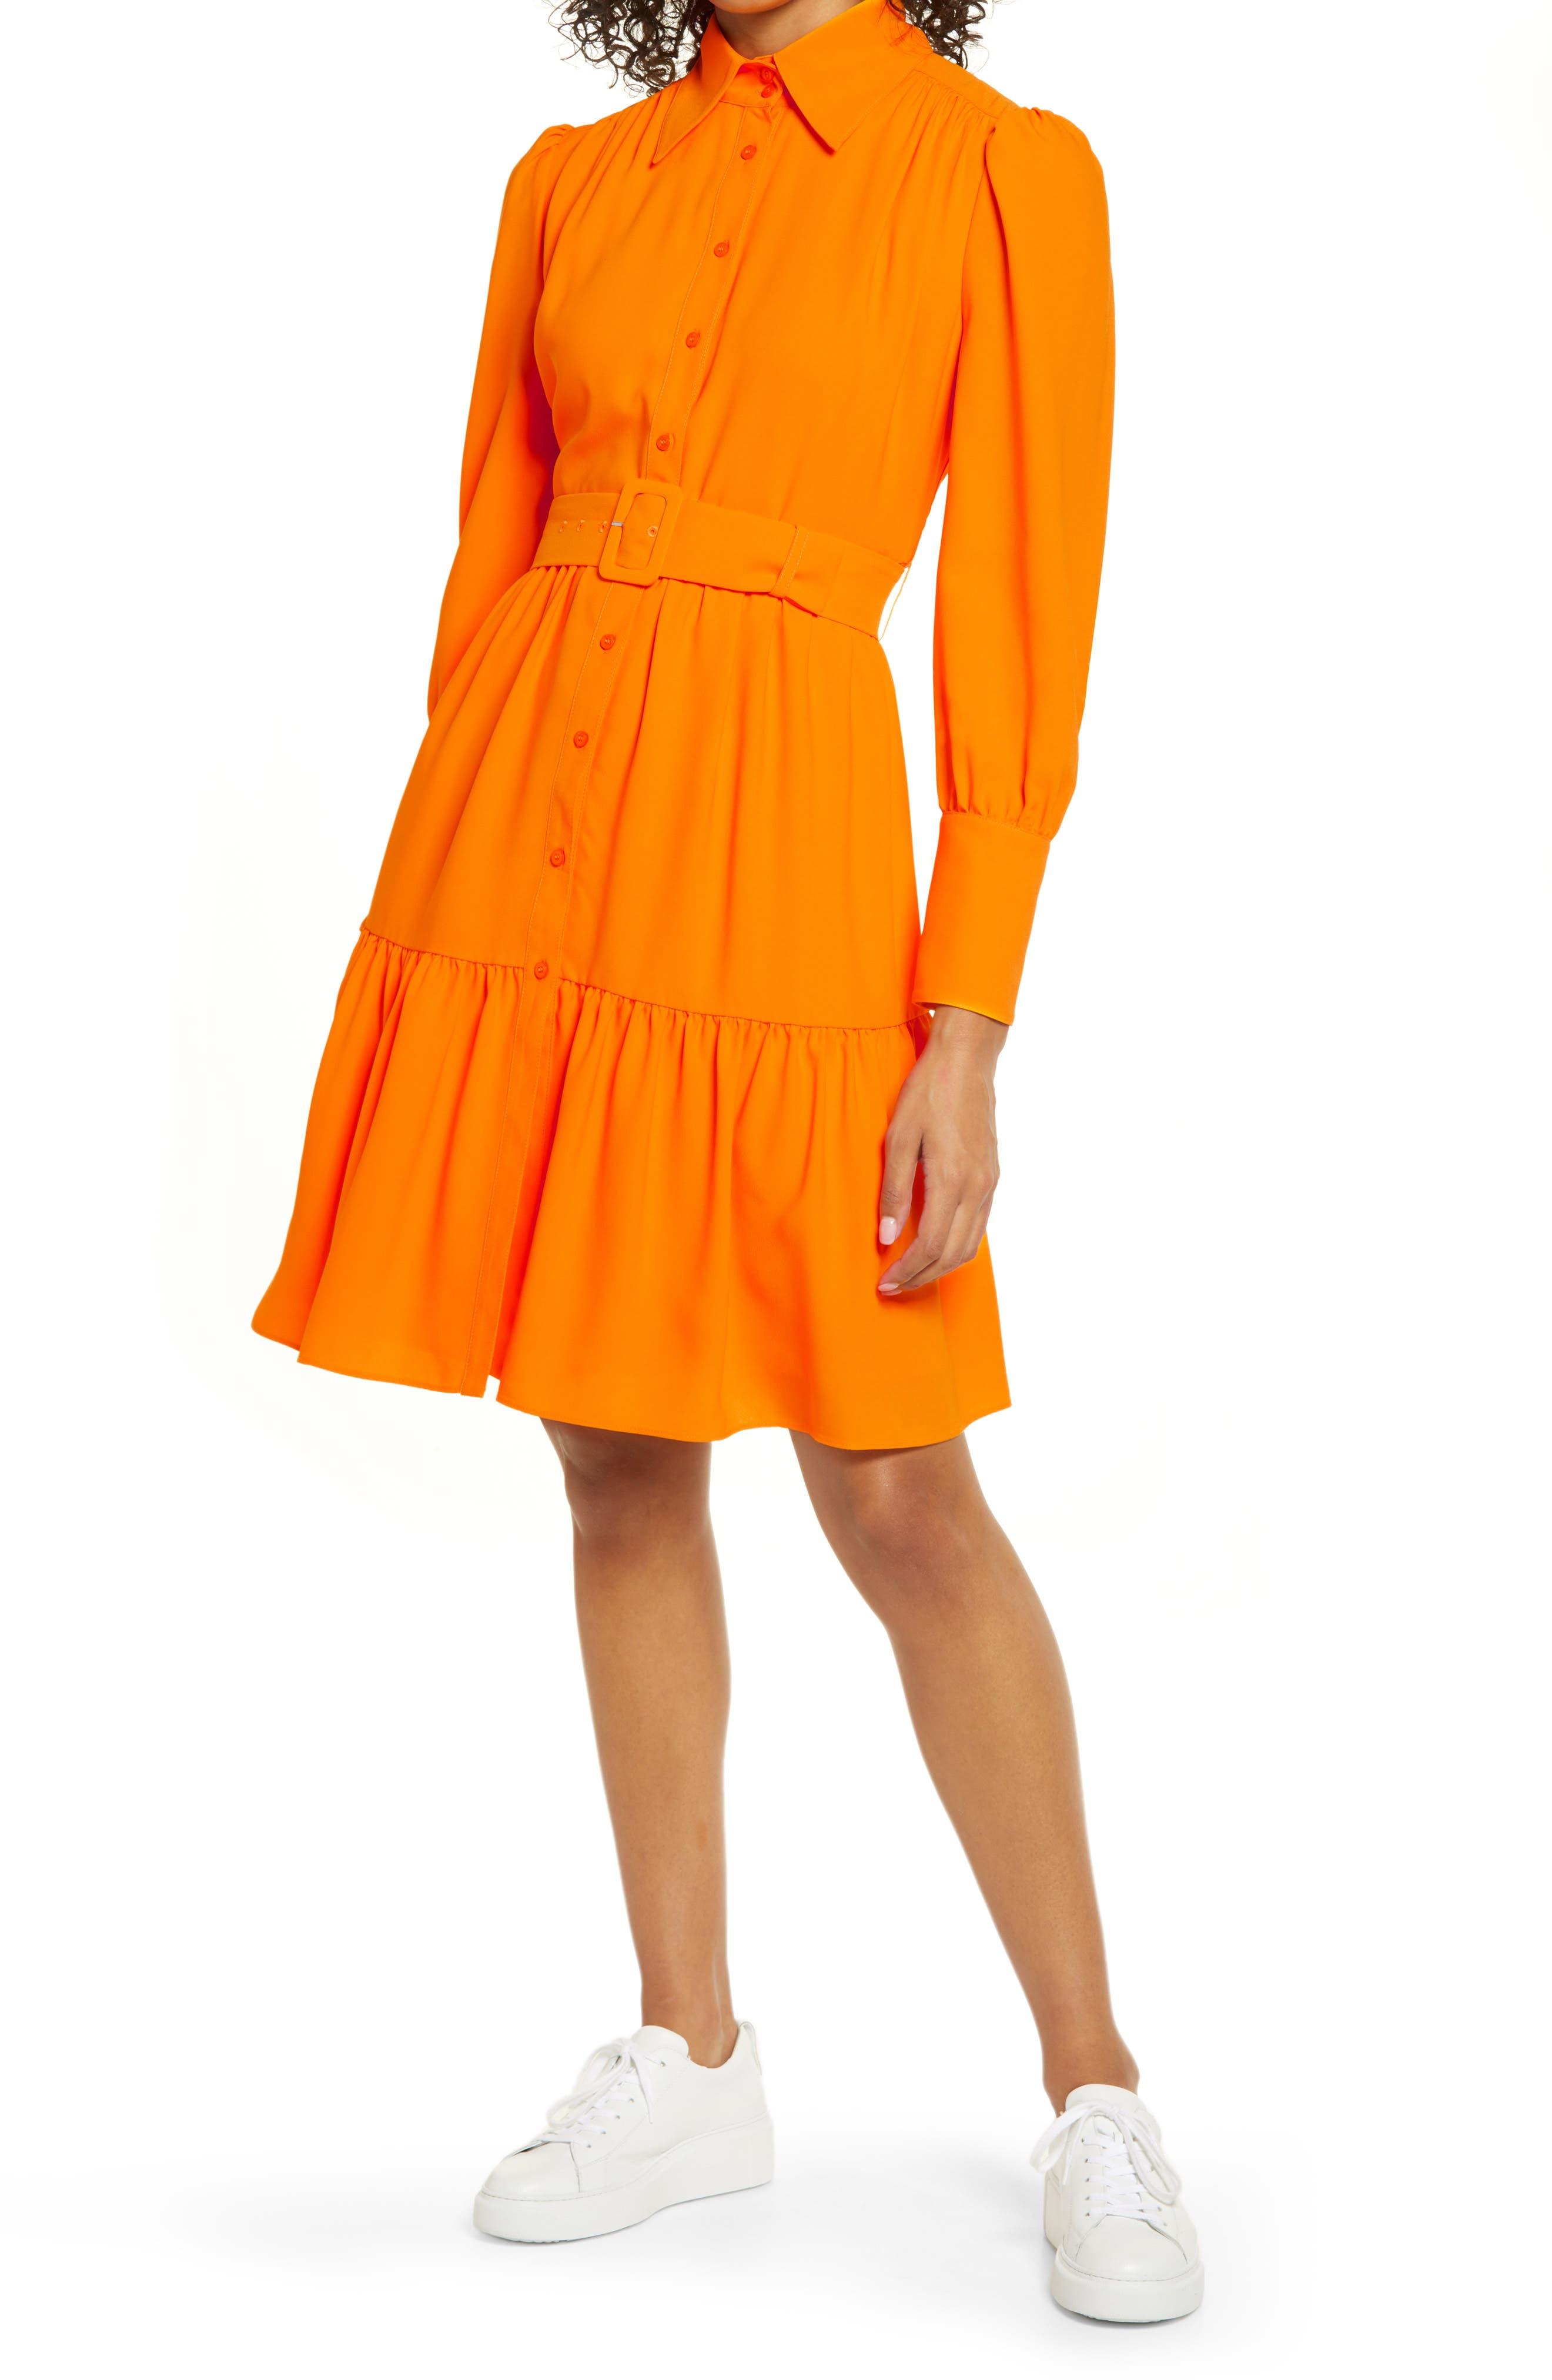 60s Dresses | 1960s Dresses Mod, Mini, Hippie Womens Halogen X Atlantic-Pacific Belted Long Sleeve Shirtdress Size 16 - Orange $119.00 AT vintagedancer.com